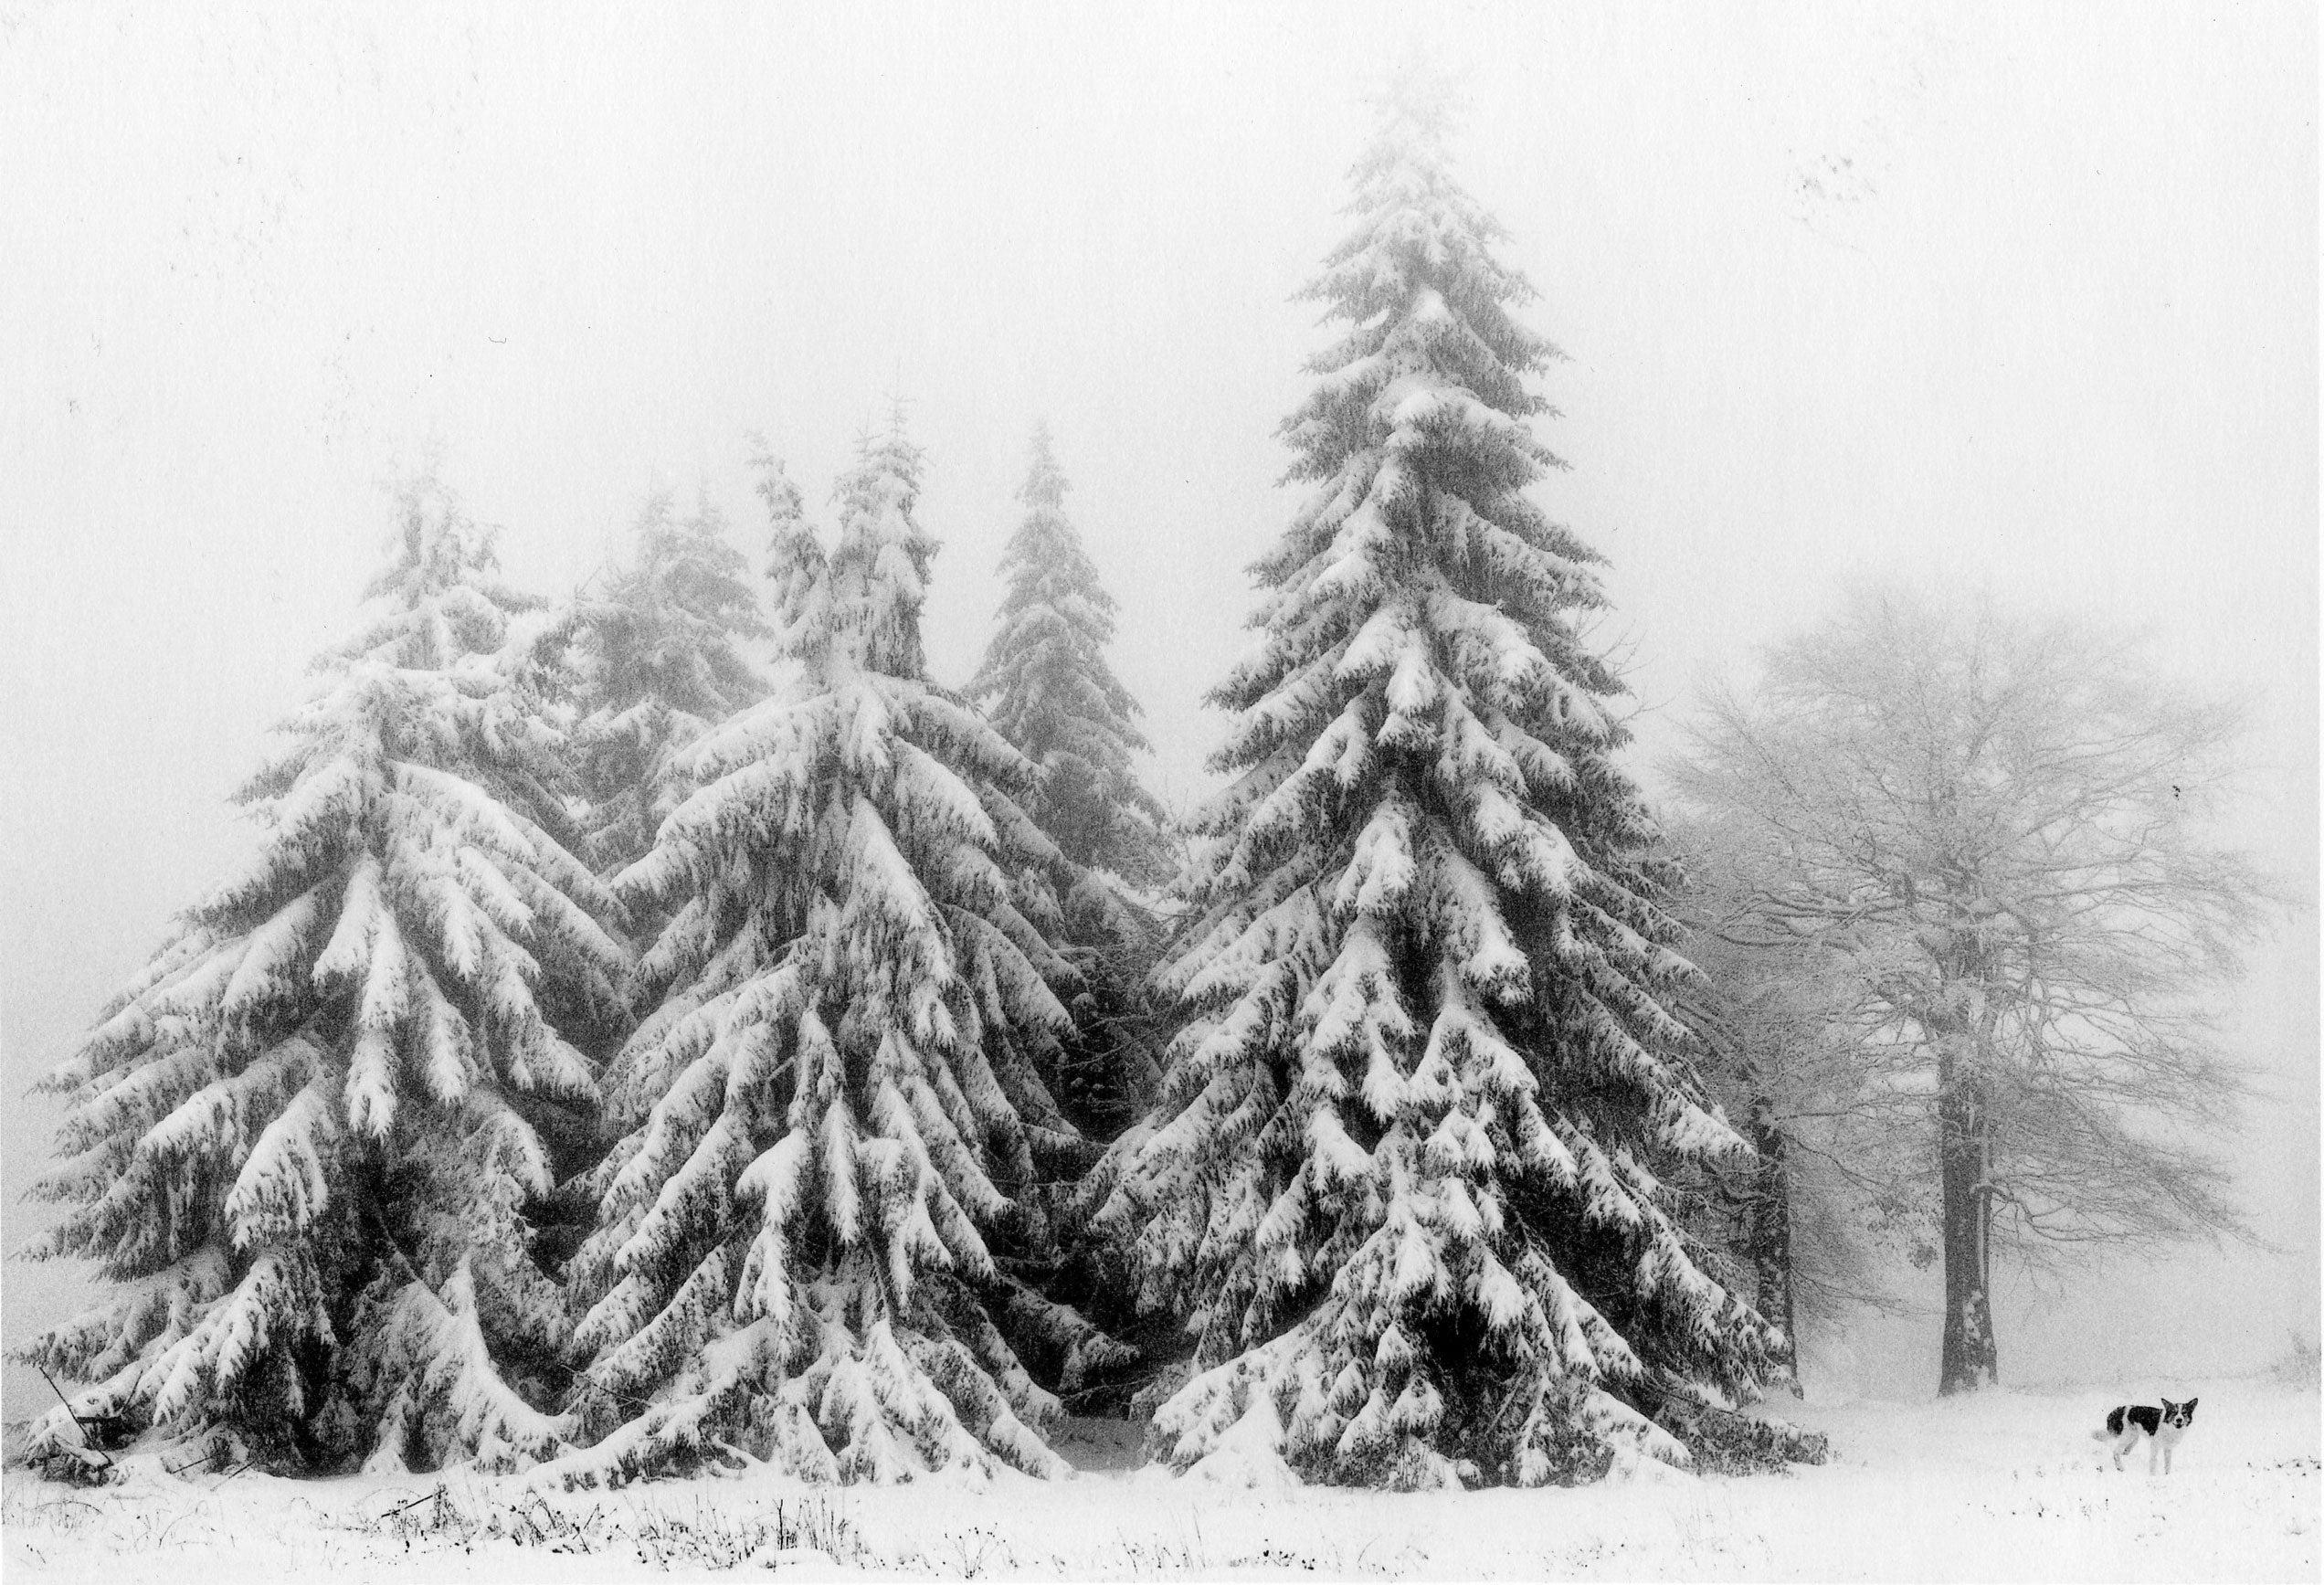 Petrohan, Bulgaria (Three Snow Covered Trees), 2003